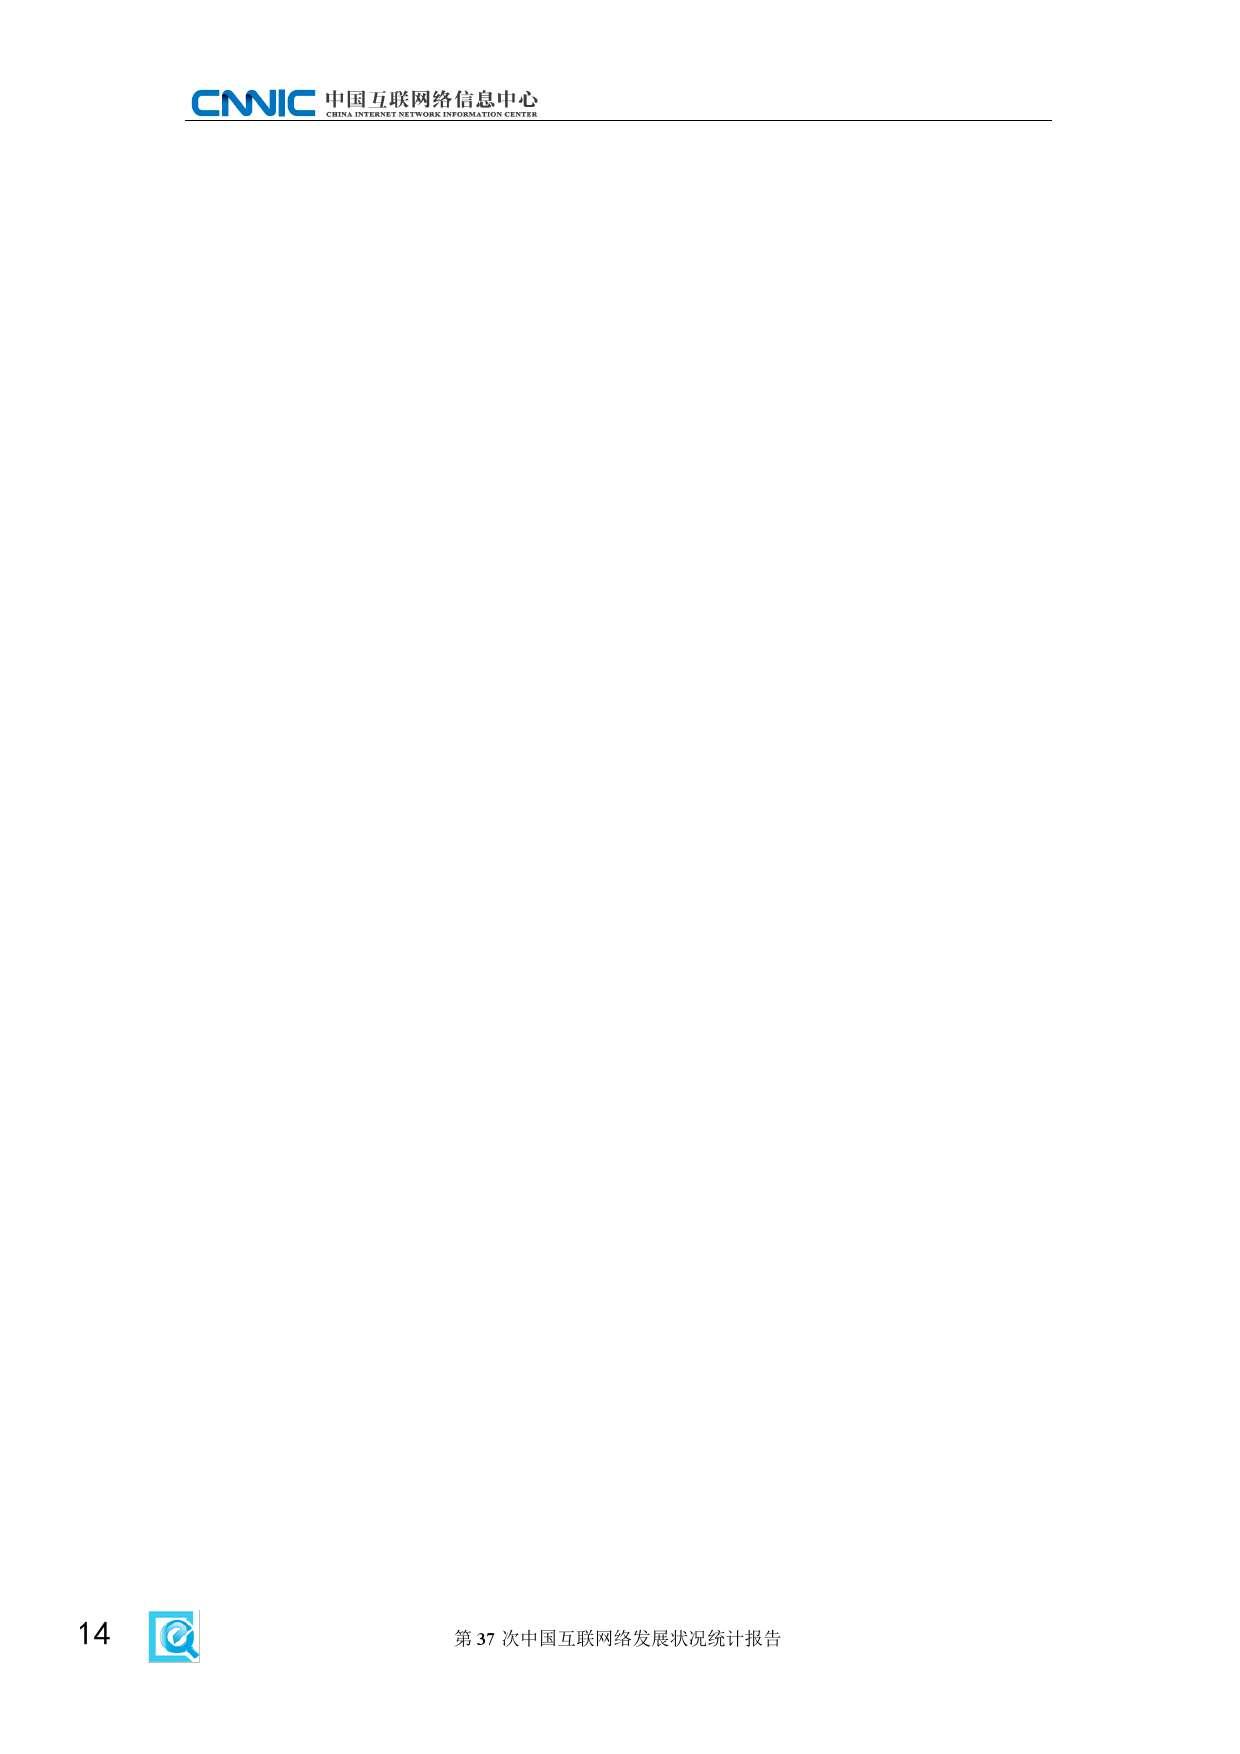 CNNIC:2015年第37次中国互联网络发展状况统计报告_000020